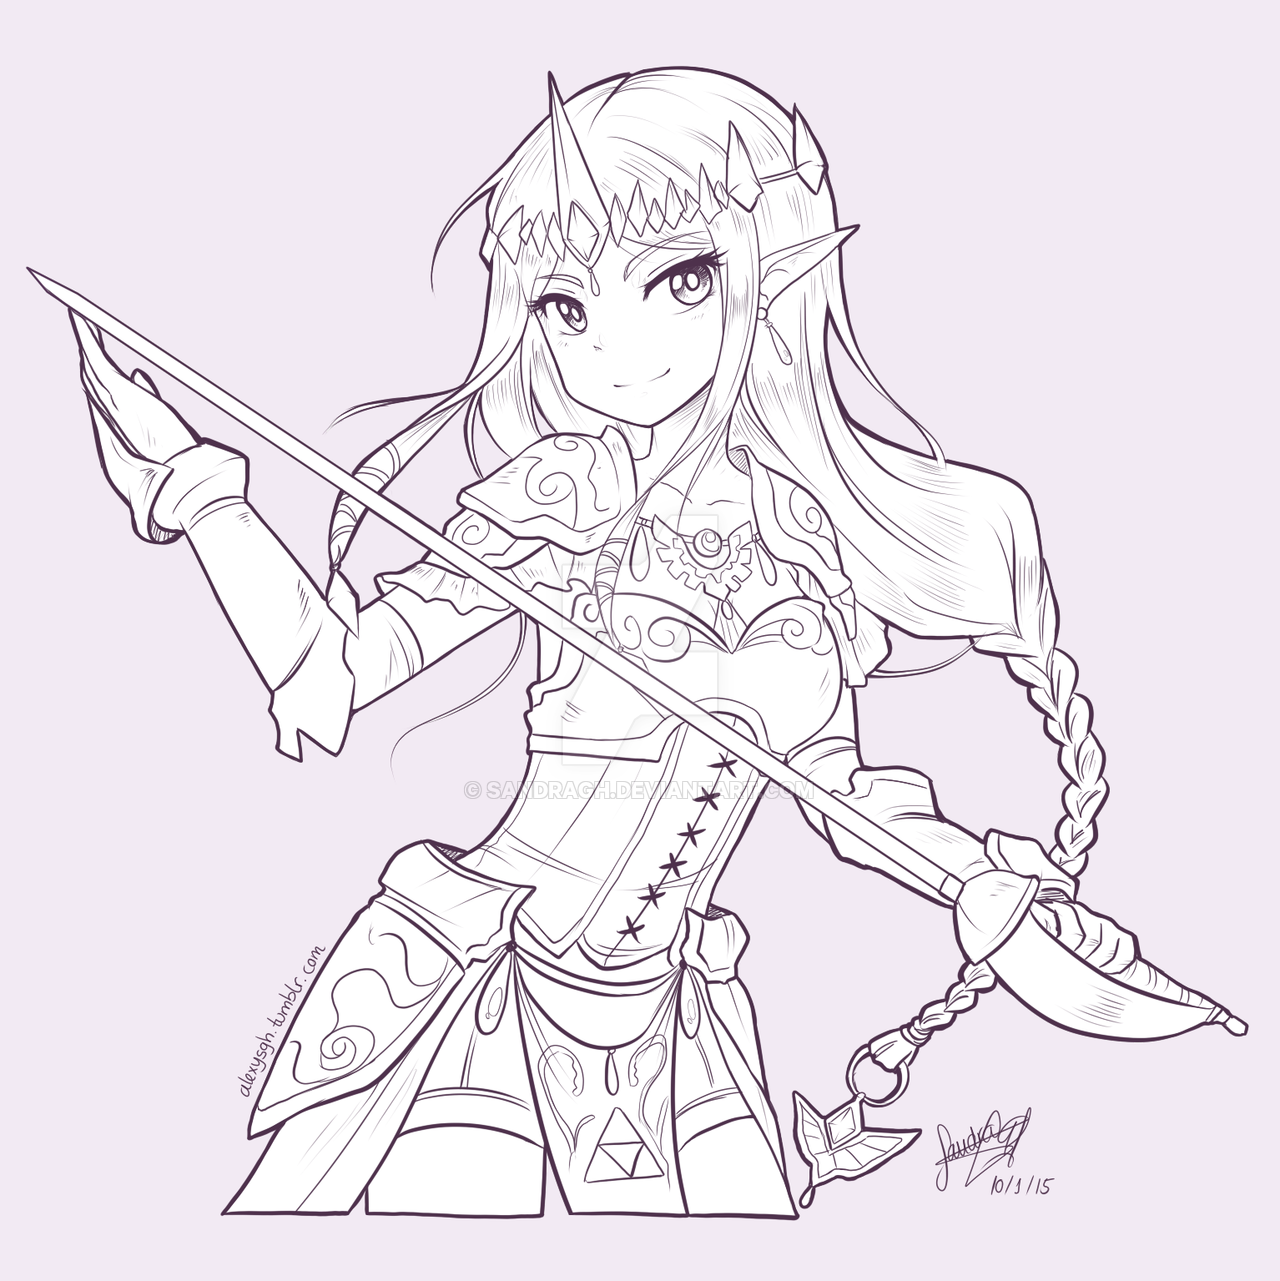 Zelda Drawing At Getdrawings Com Free For Personal Use Zelda